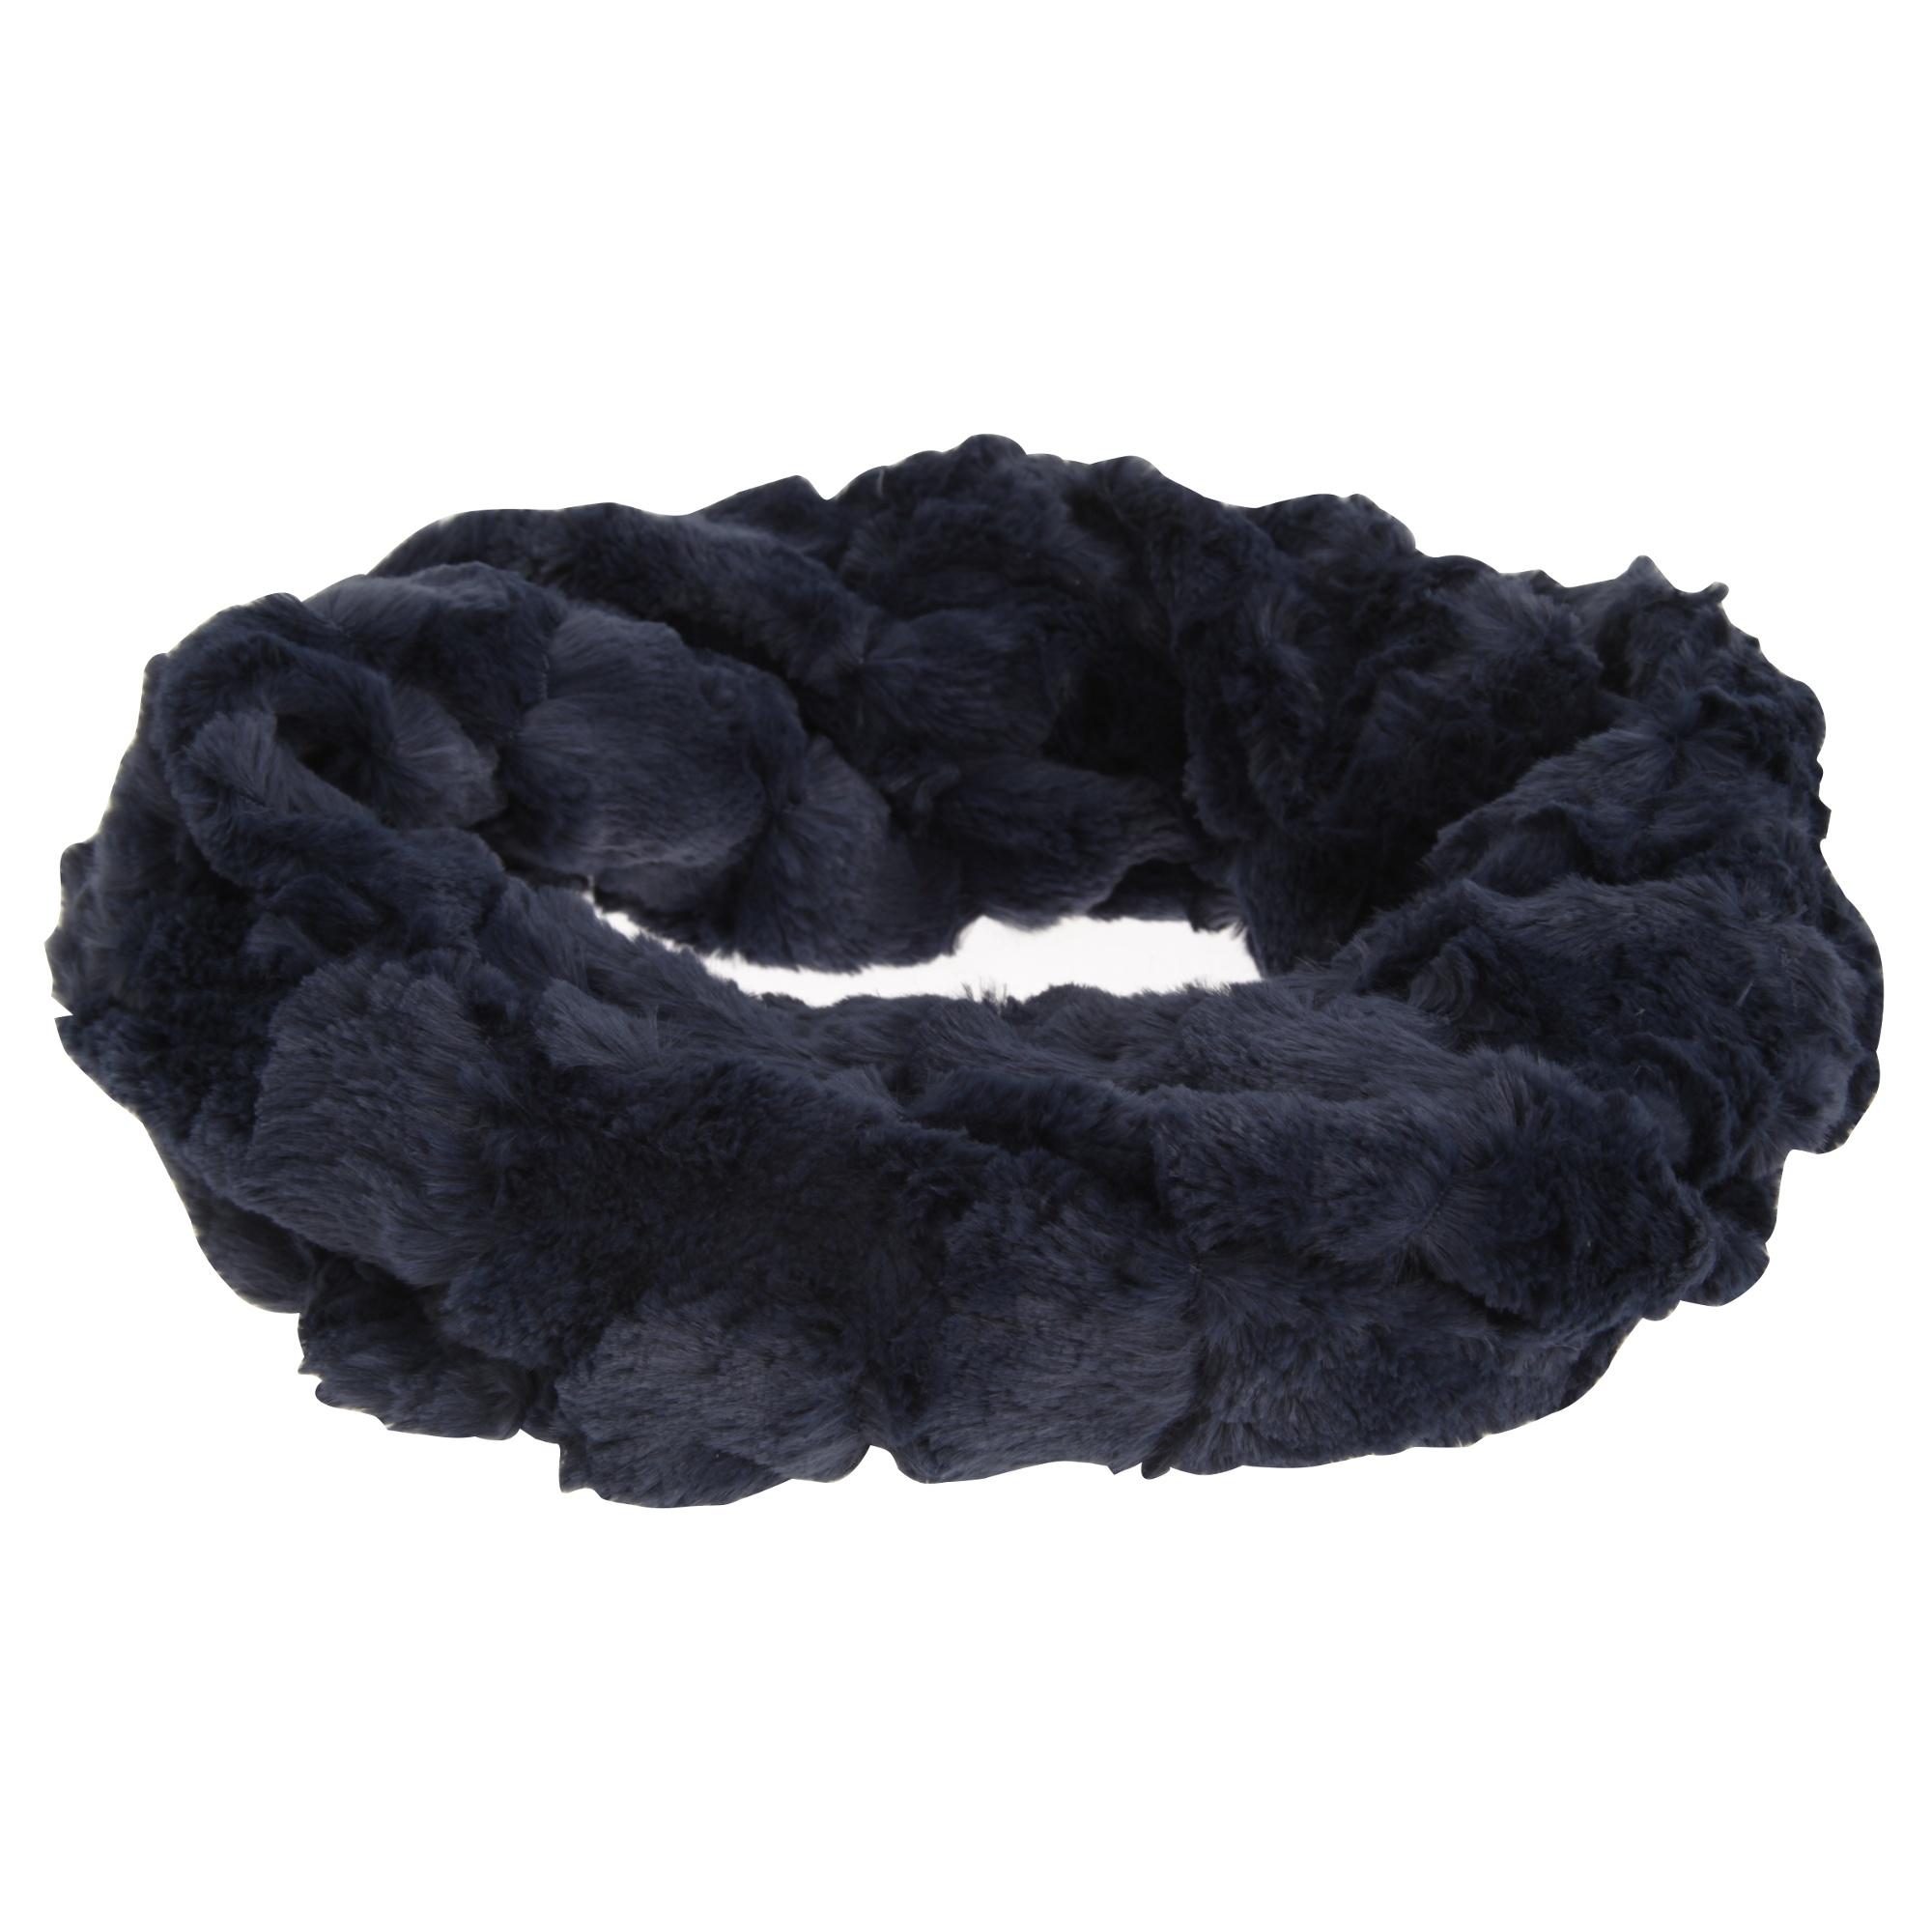 Foxbury Womens/Ladies Faux Fur Snood (One Size) (Navy)